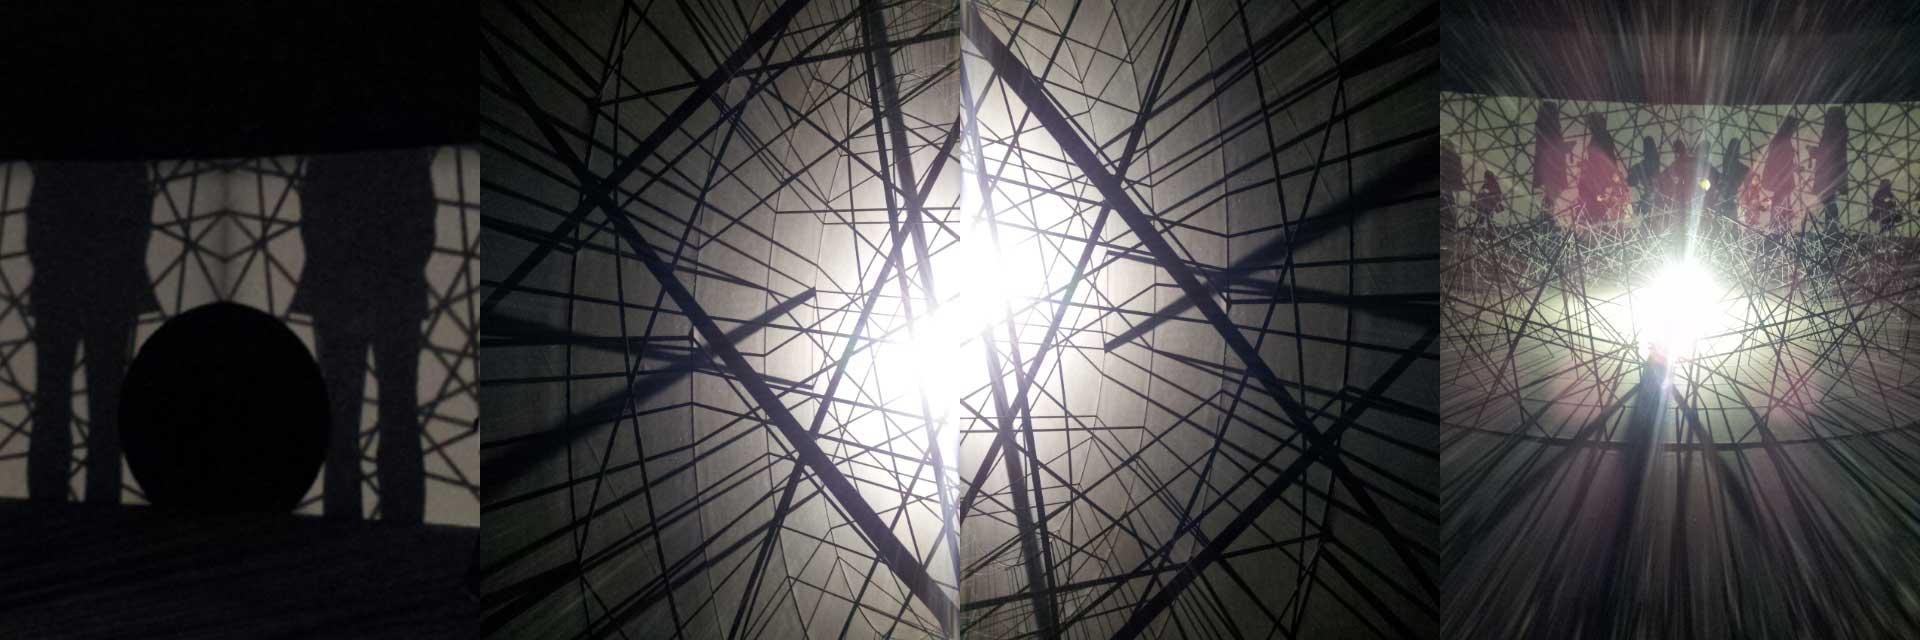 Olafur-Elliason-Installation-Shadow-Fondation-Vuitton